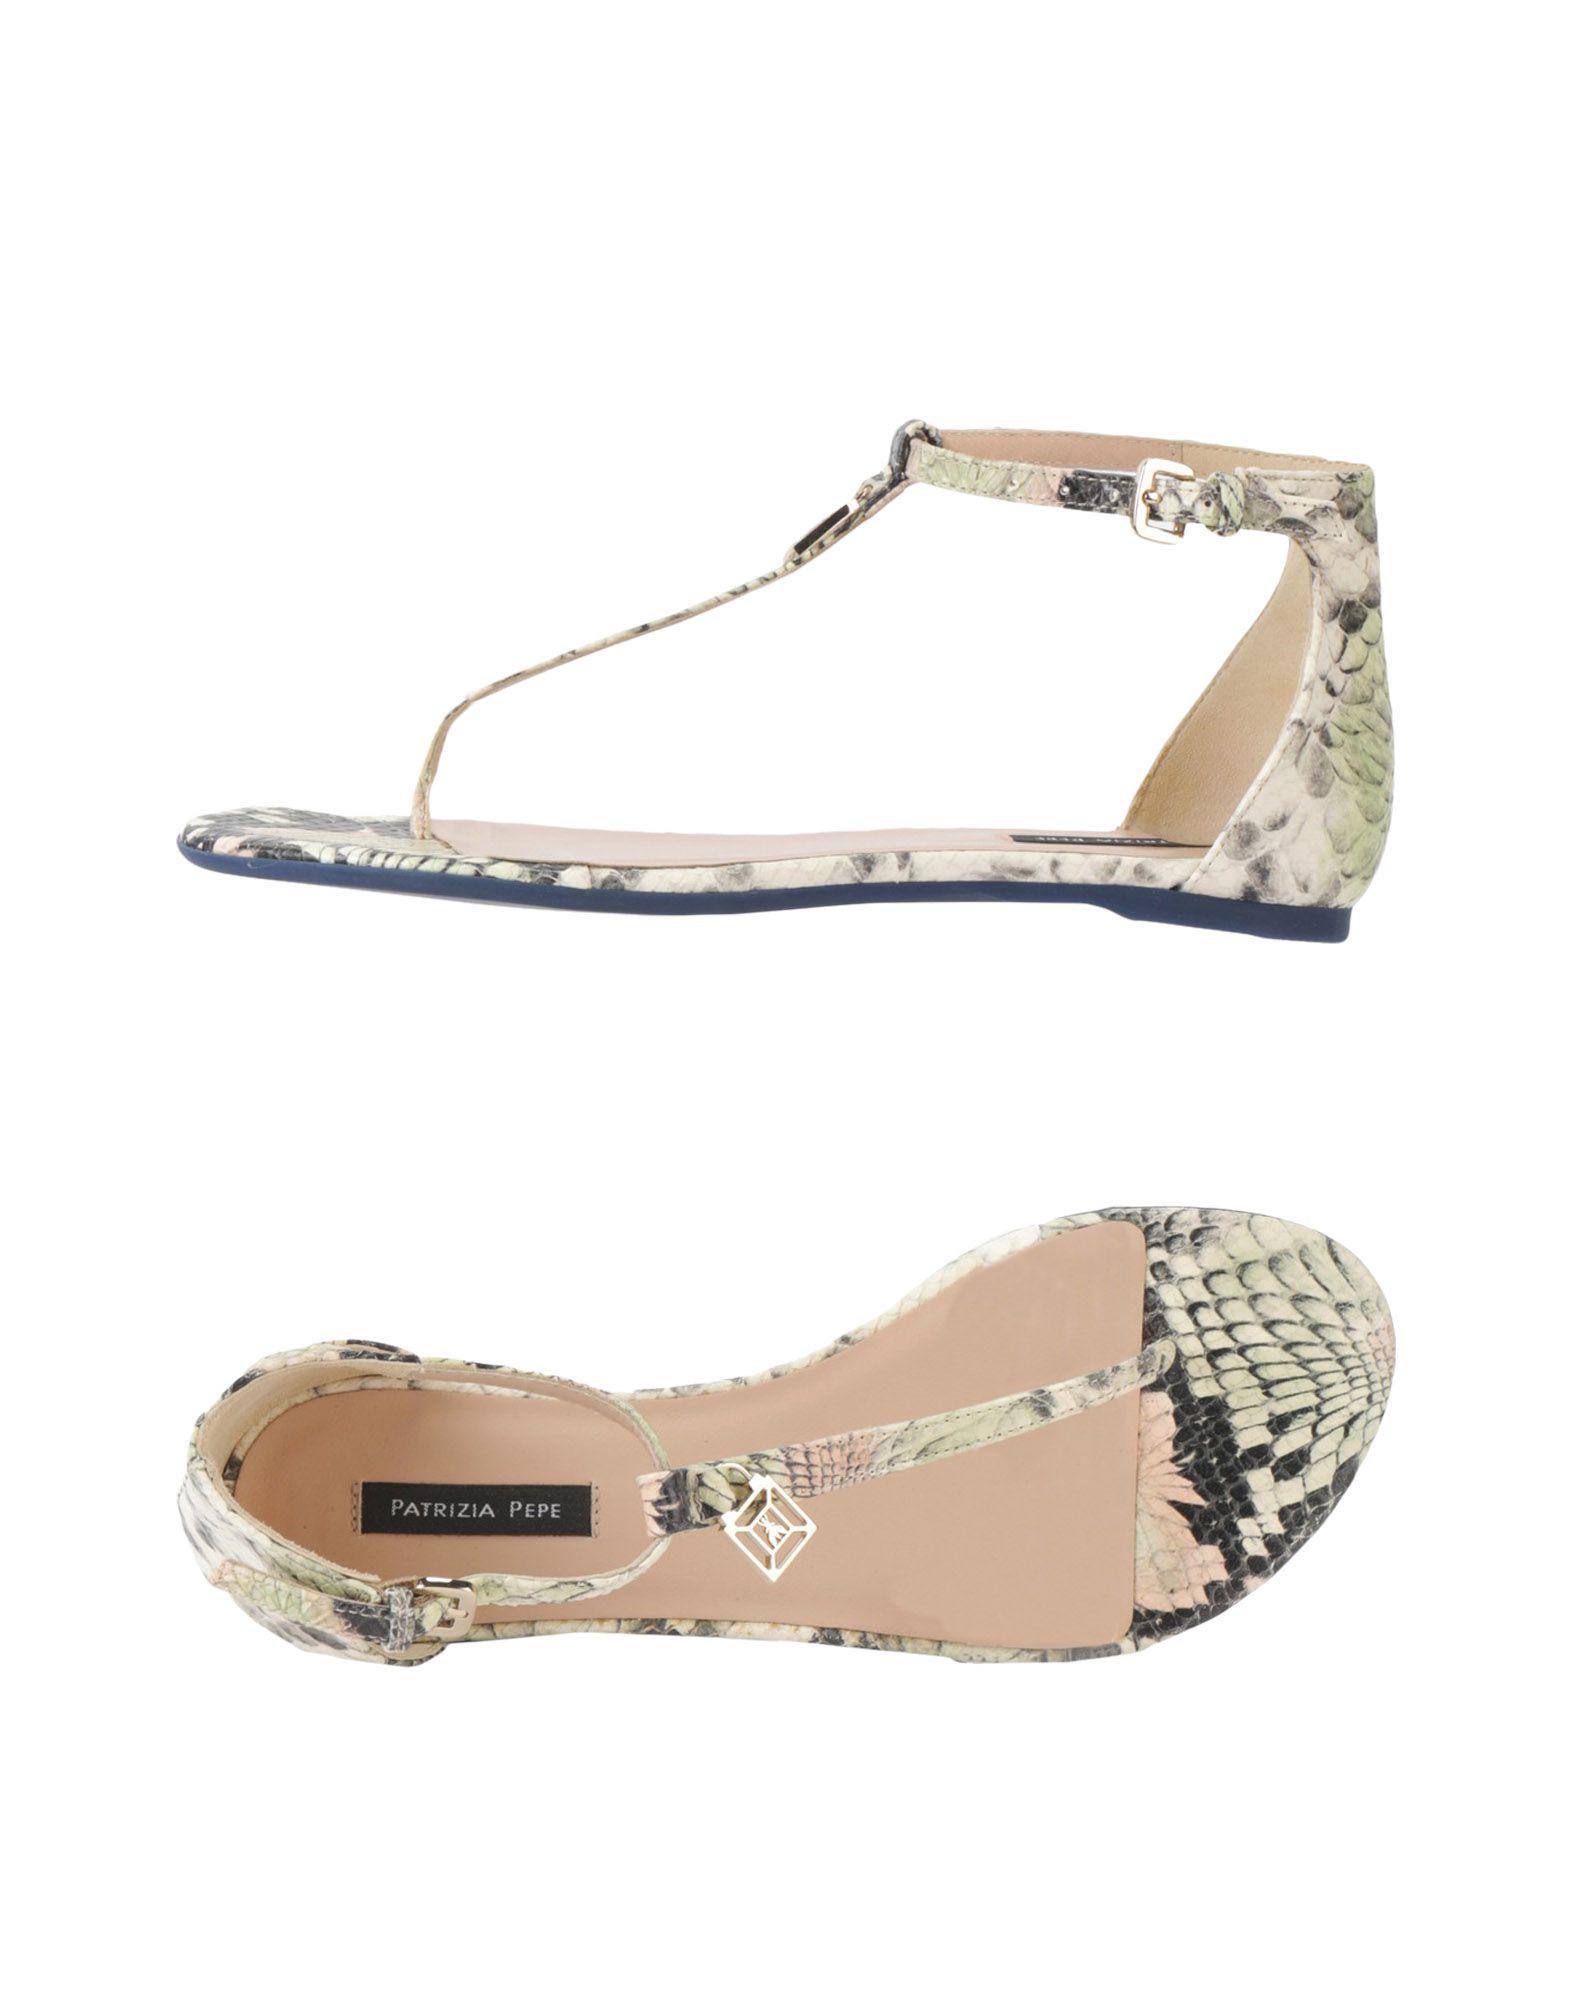 Patrizia Pepe Dianetten Damen  11362010GJ Qualität Gute Qualität 11362010GJ beliebte Schuhe f12c80